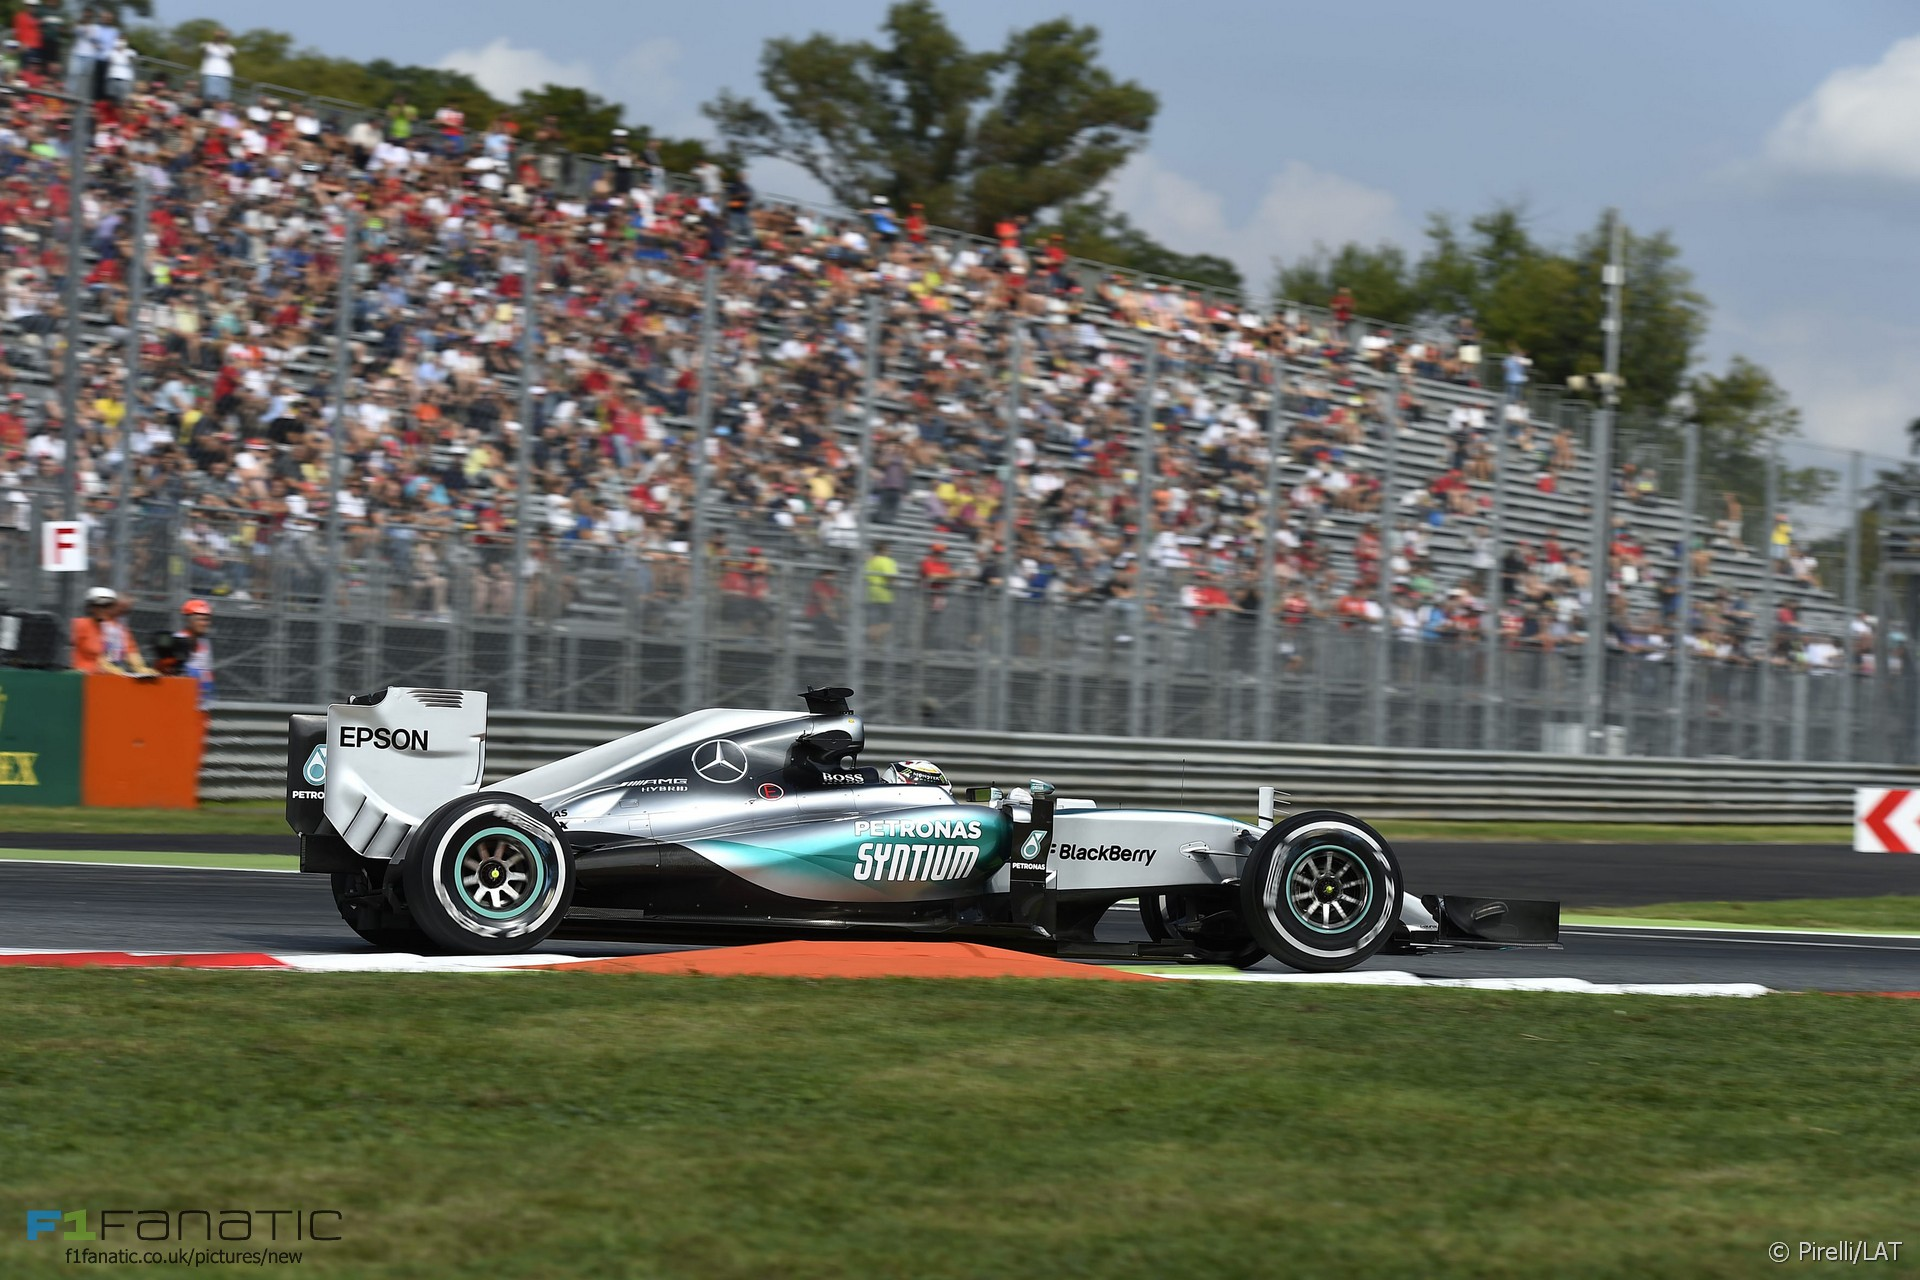 Lewis Hamilton, Mercedes, Monza, 2015